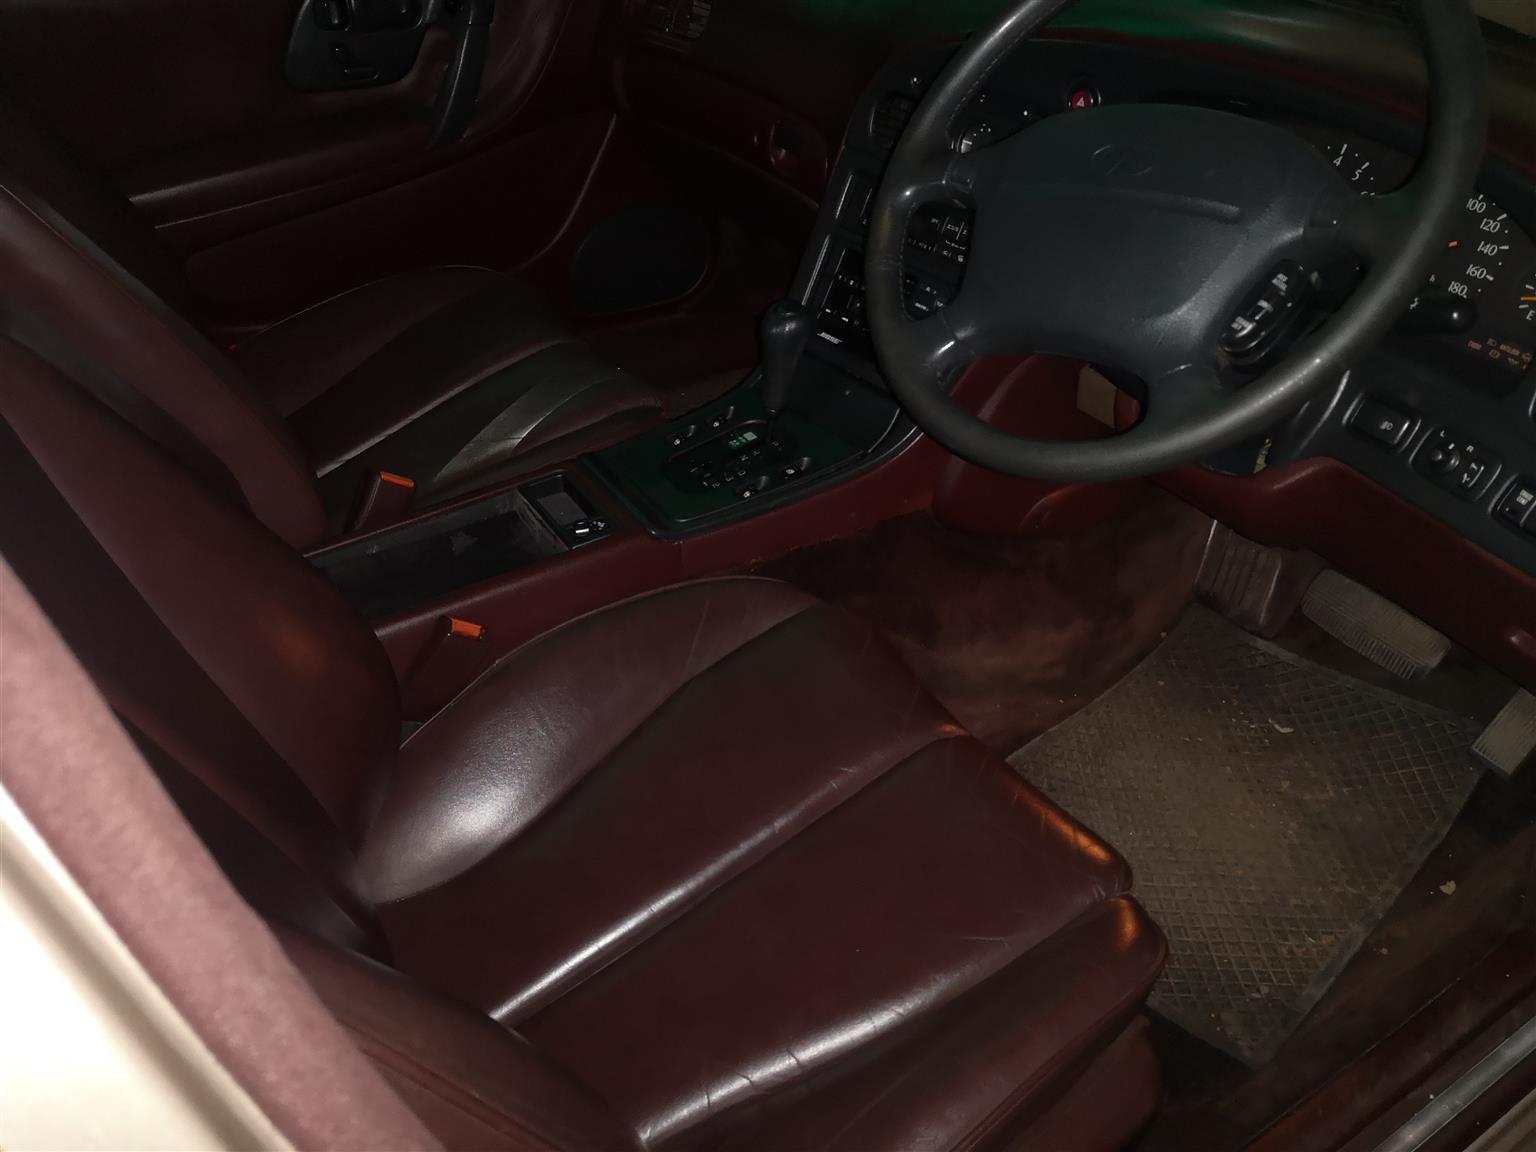 1990 Infiniti Q50 S Hybrid